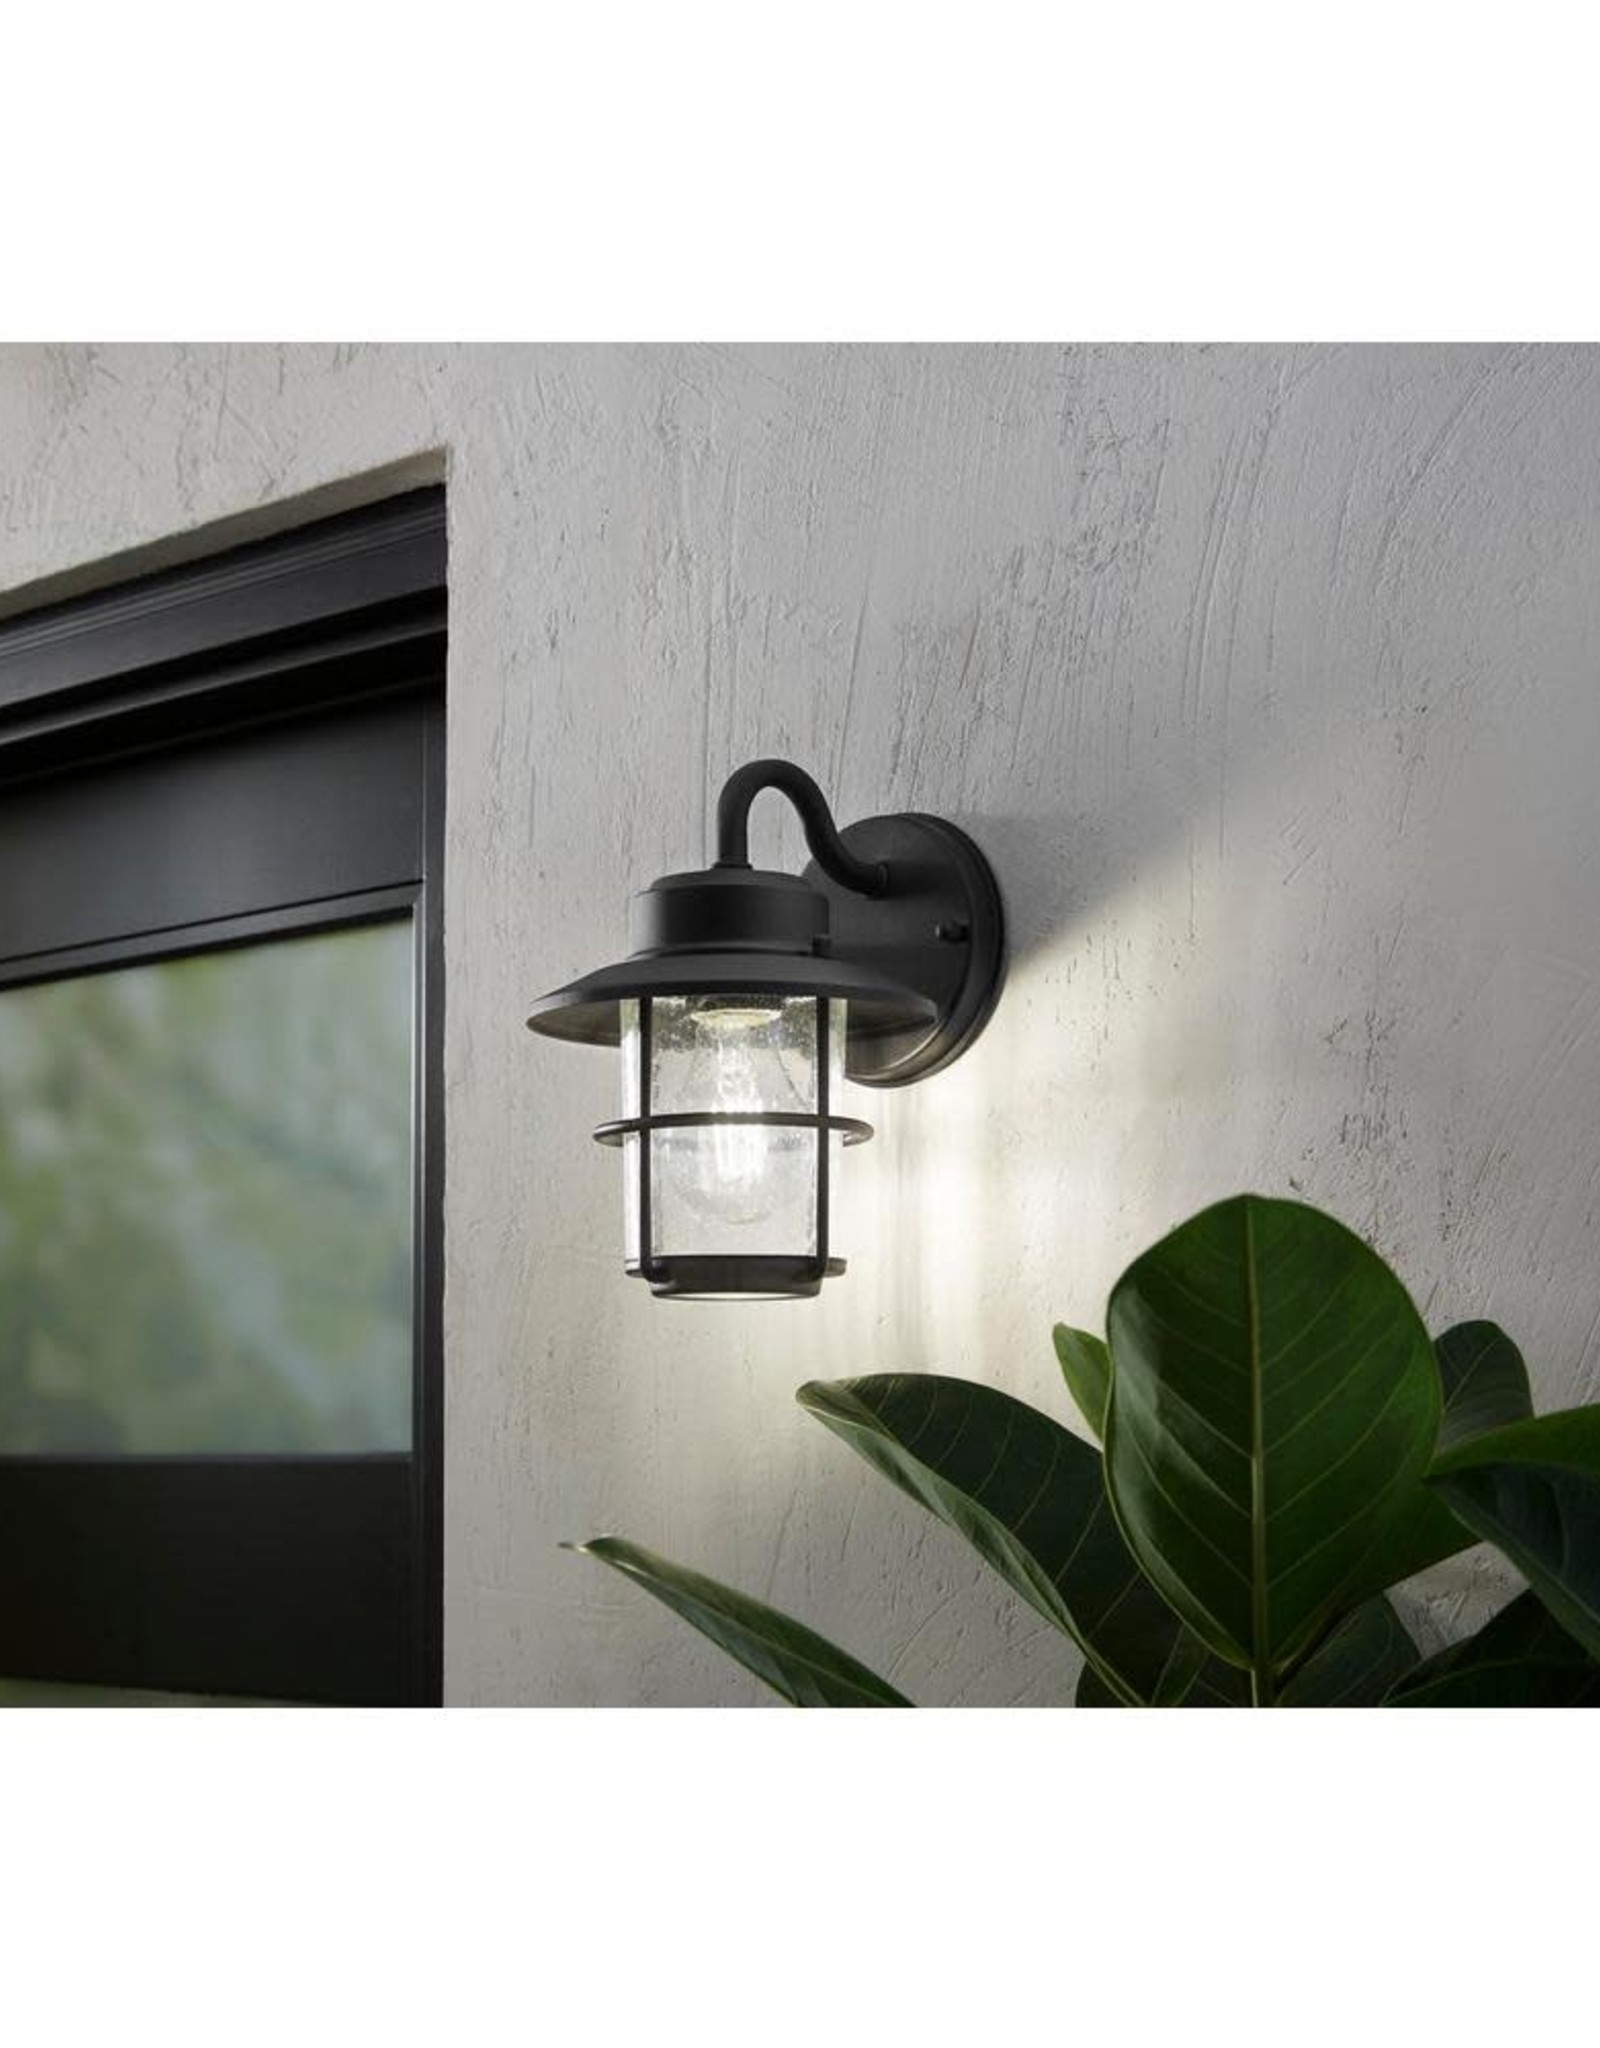 1 Light Black Outdoor Wall Lantern Sconce 2 Pack 258 4530 Low Tide Liquidation